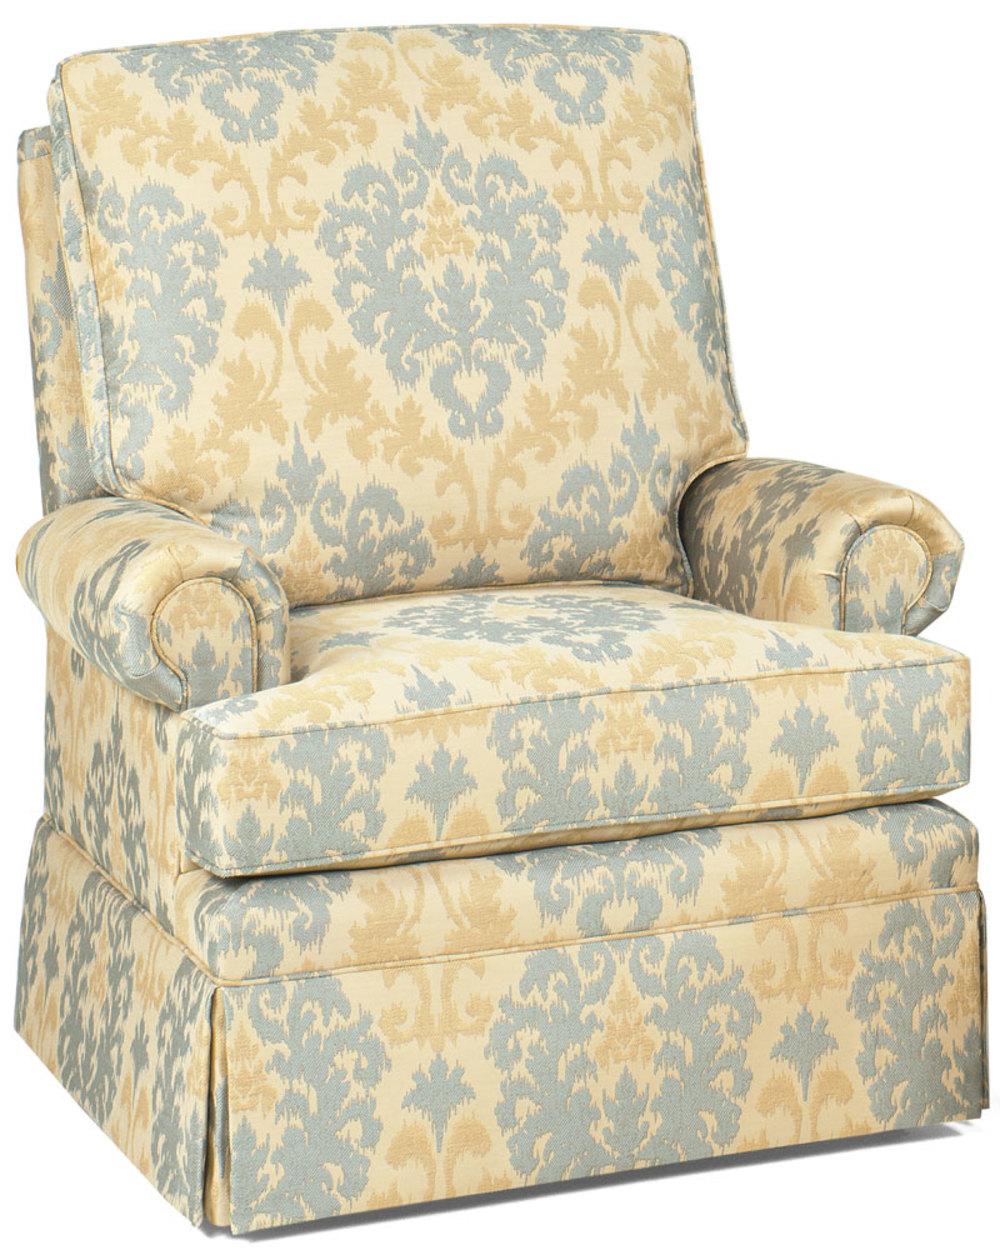 Temple Furniture - Shelby Tilt Chair